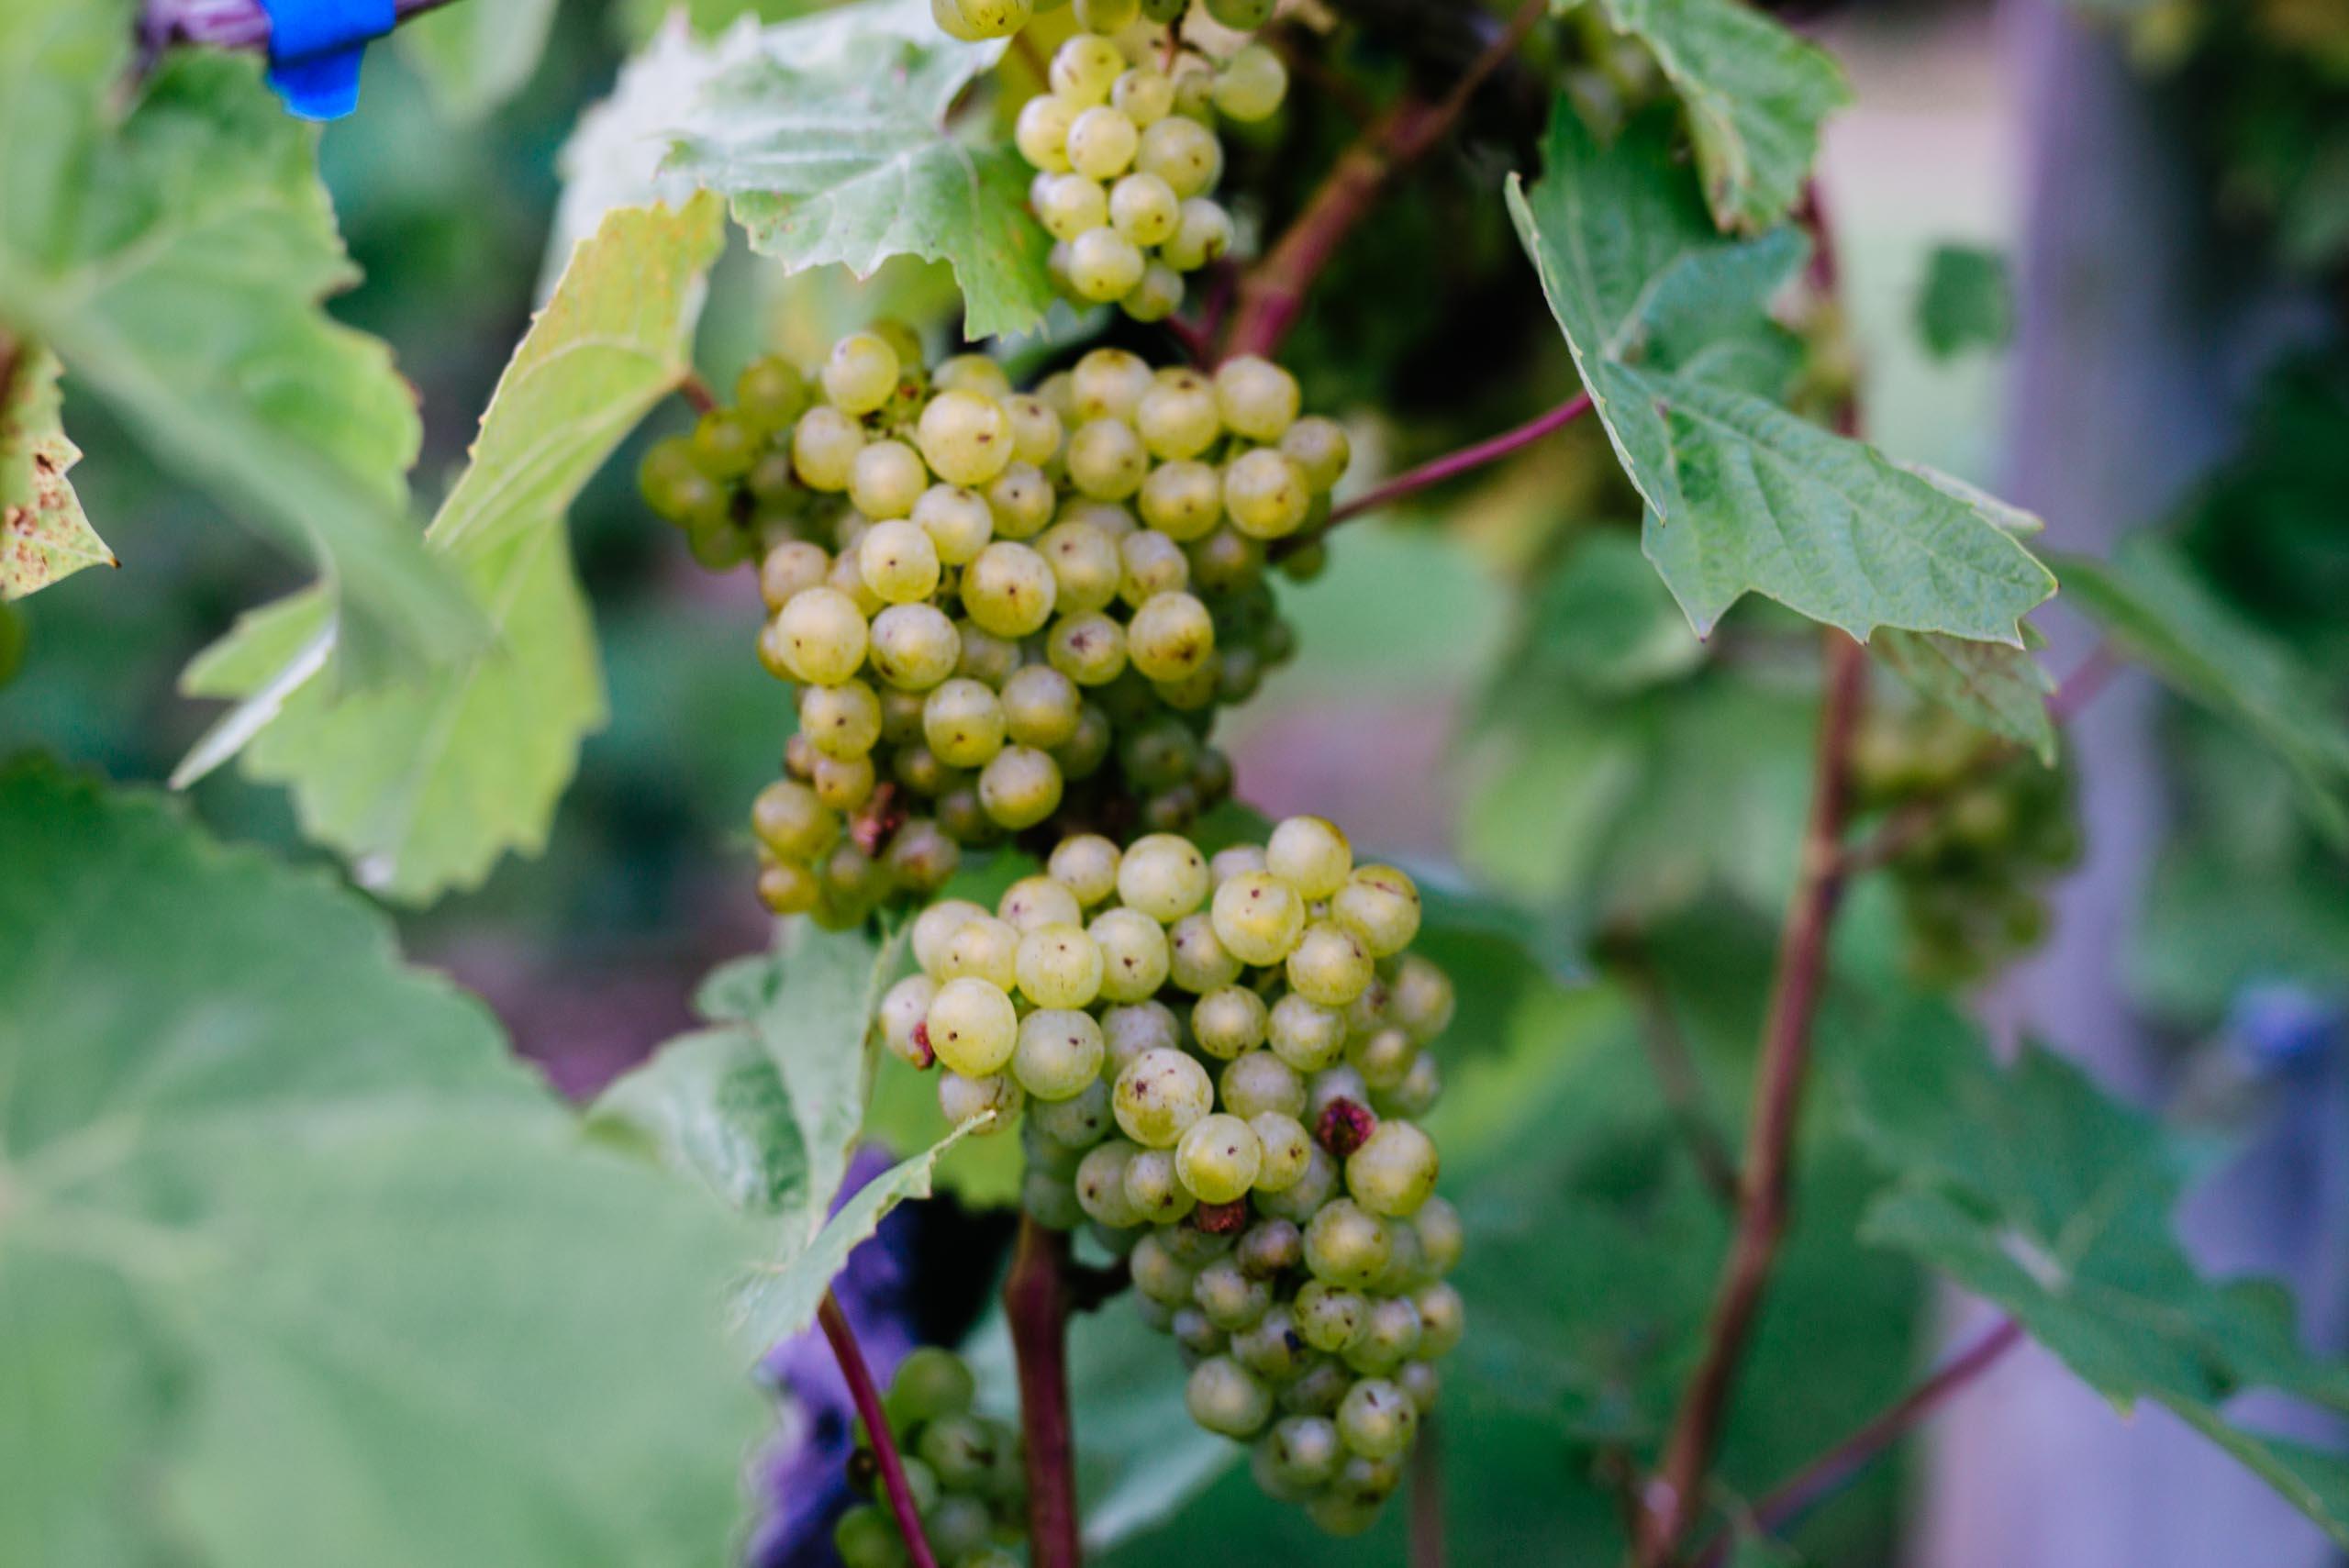 Vineyard Harvest